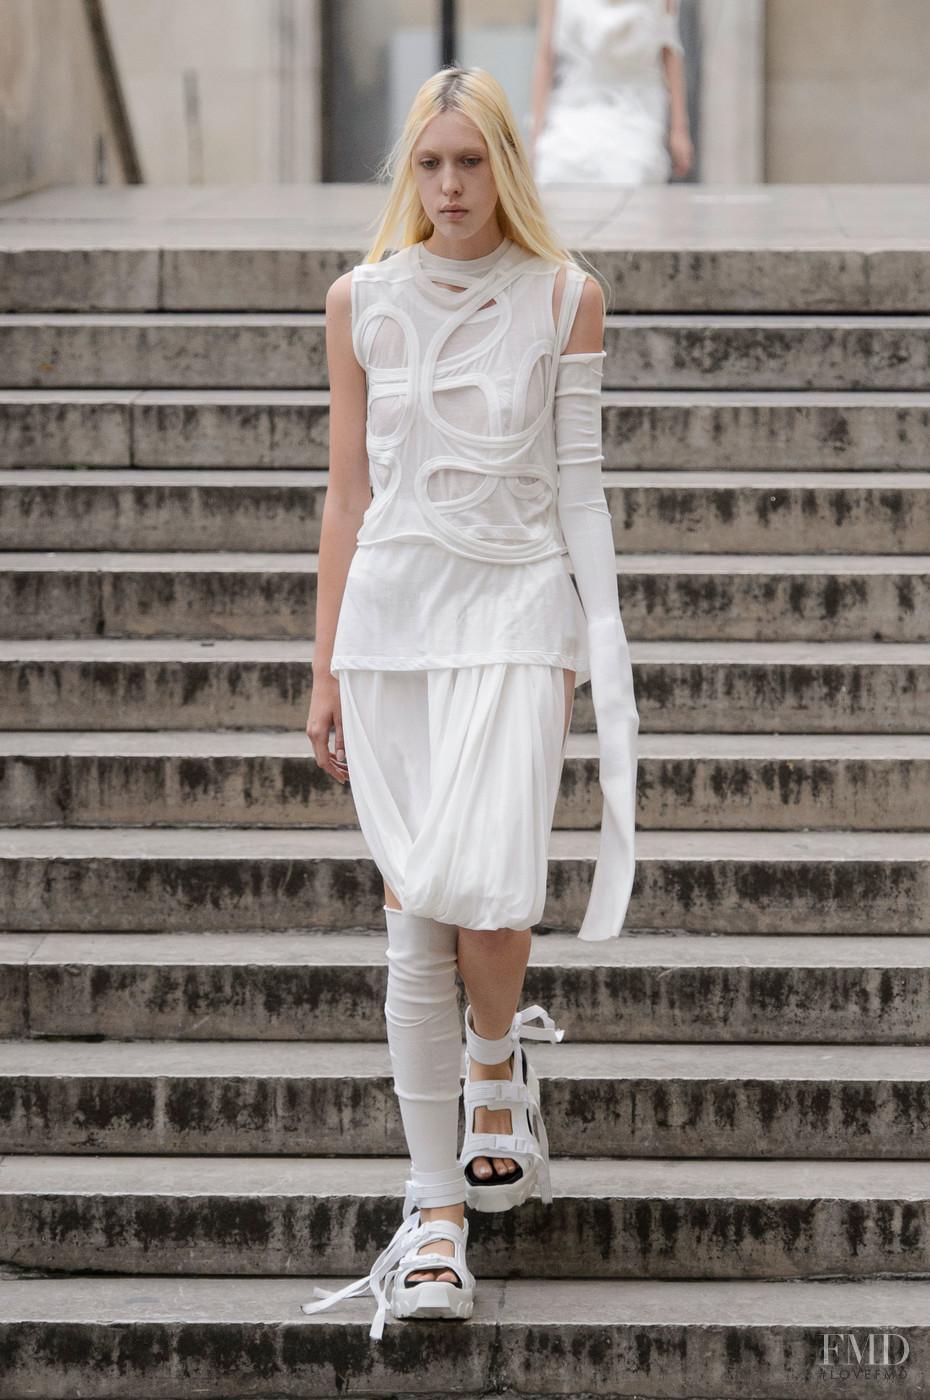 Rick owens fashion show 2018 19